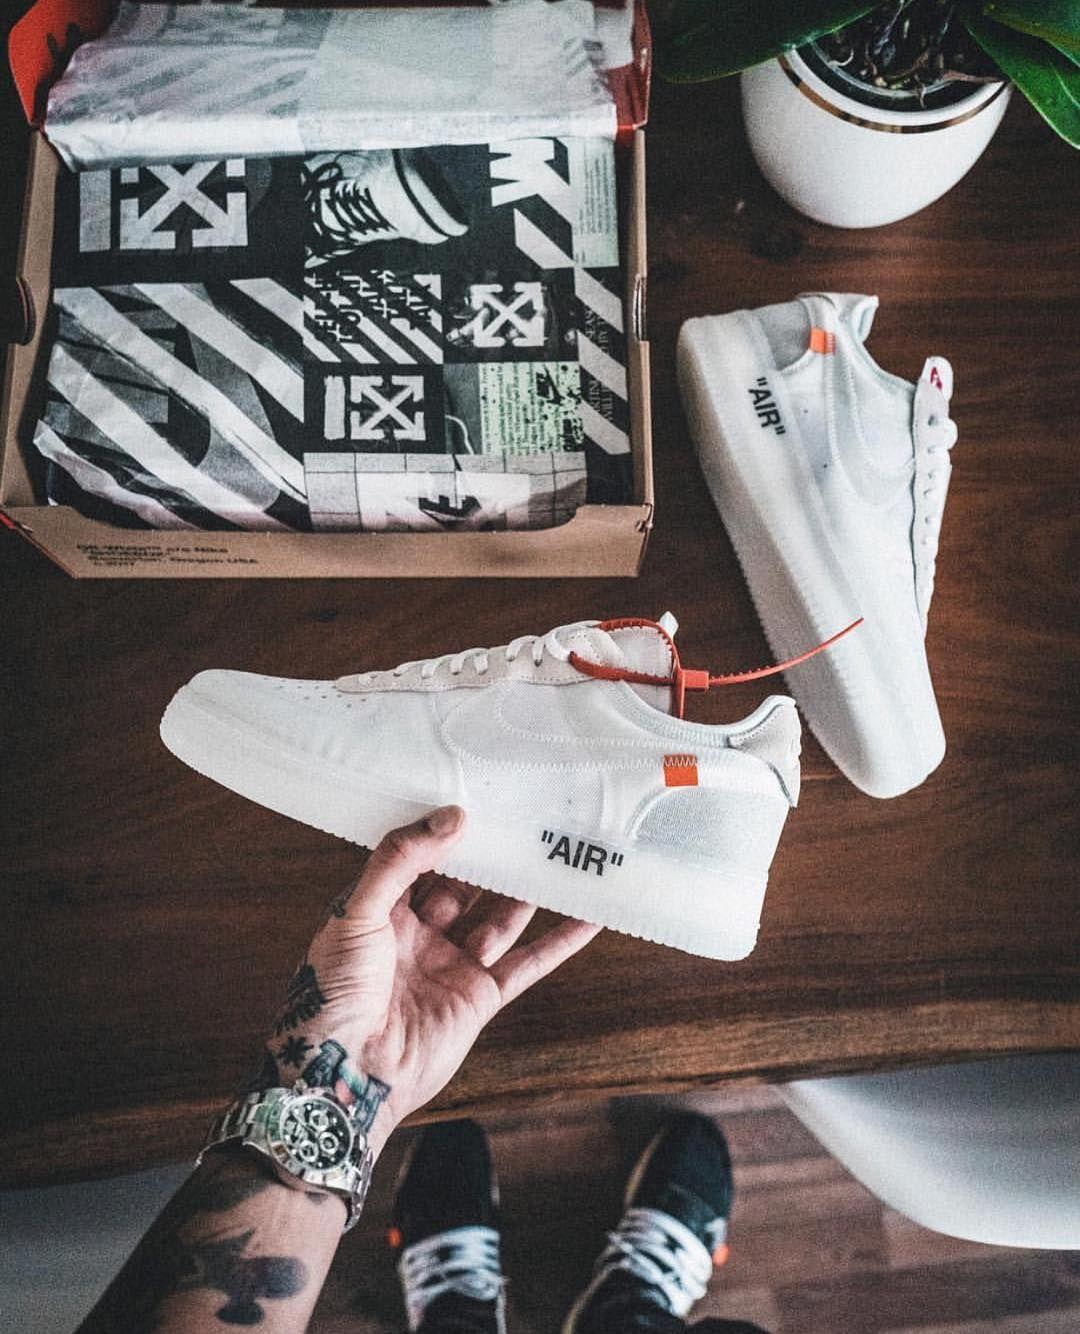 buy online fe3d9 59800 Calzado Nike.  off    white  virgilabloh  AF1  TheTen by  willy  sadp  Zapatillas Para Salir